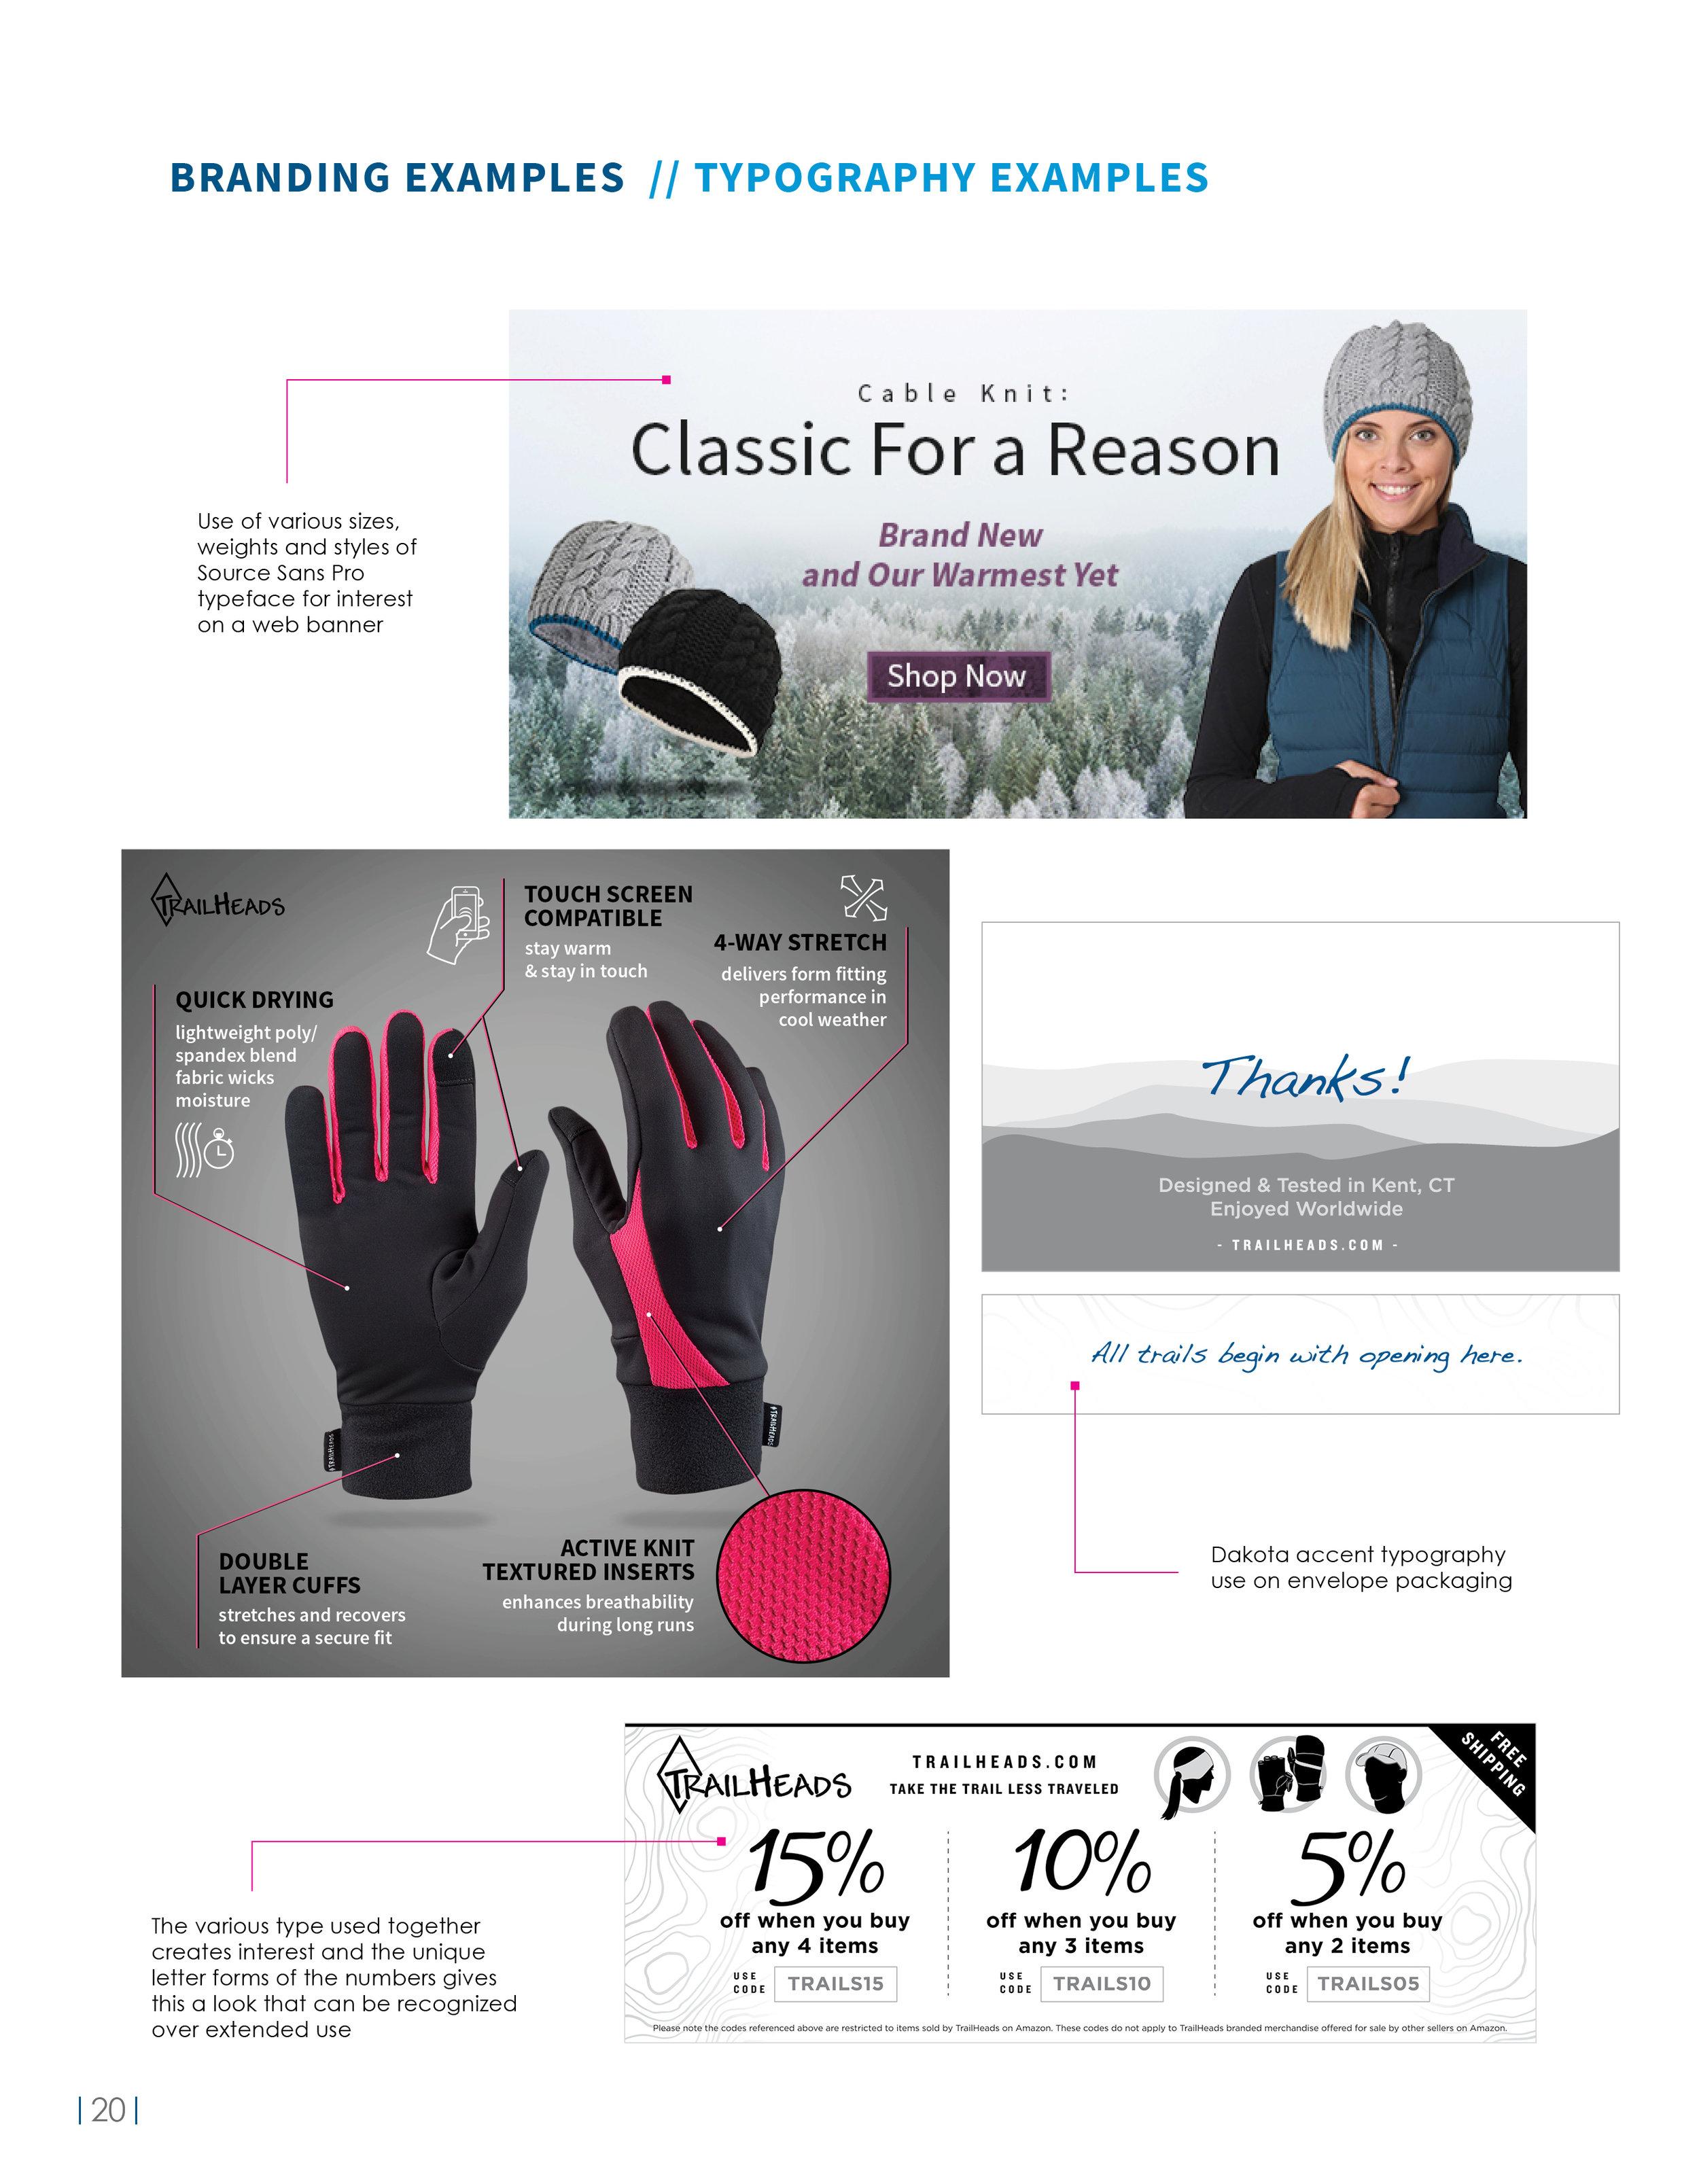 apparel-company-brand-guidelines-design-by-jordan-fretz-design-120.jpg